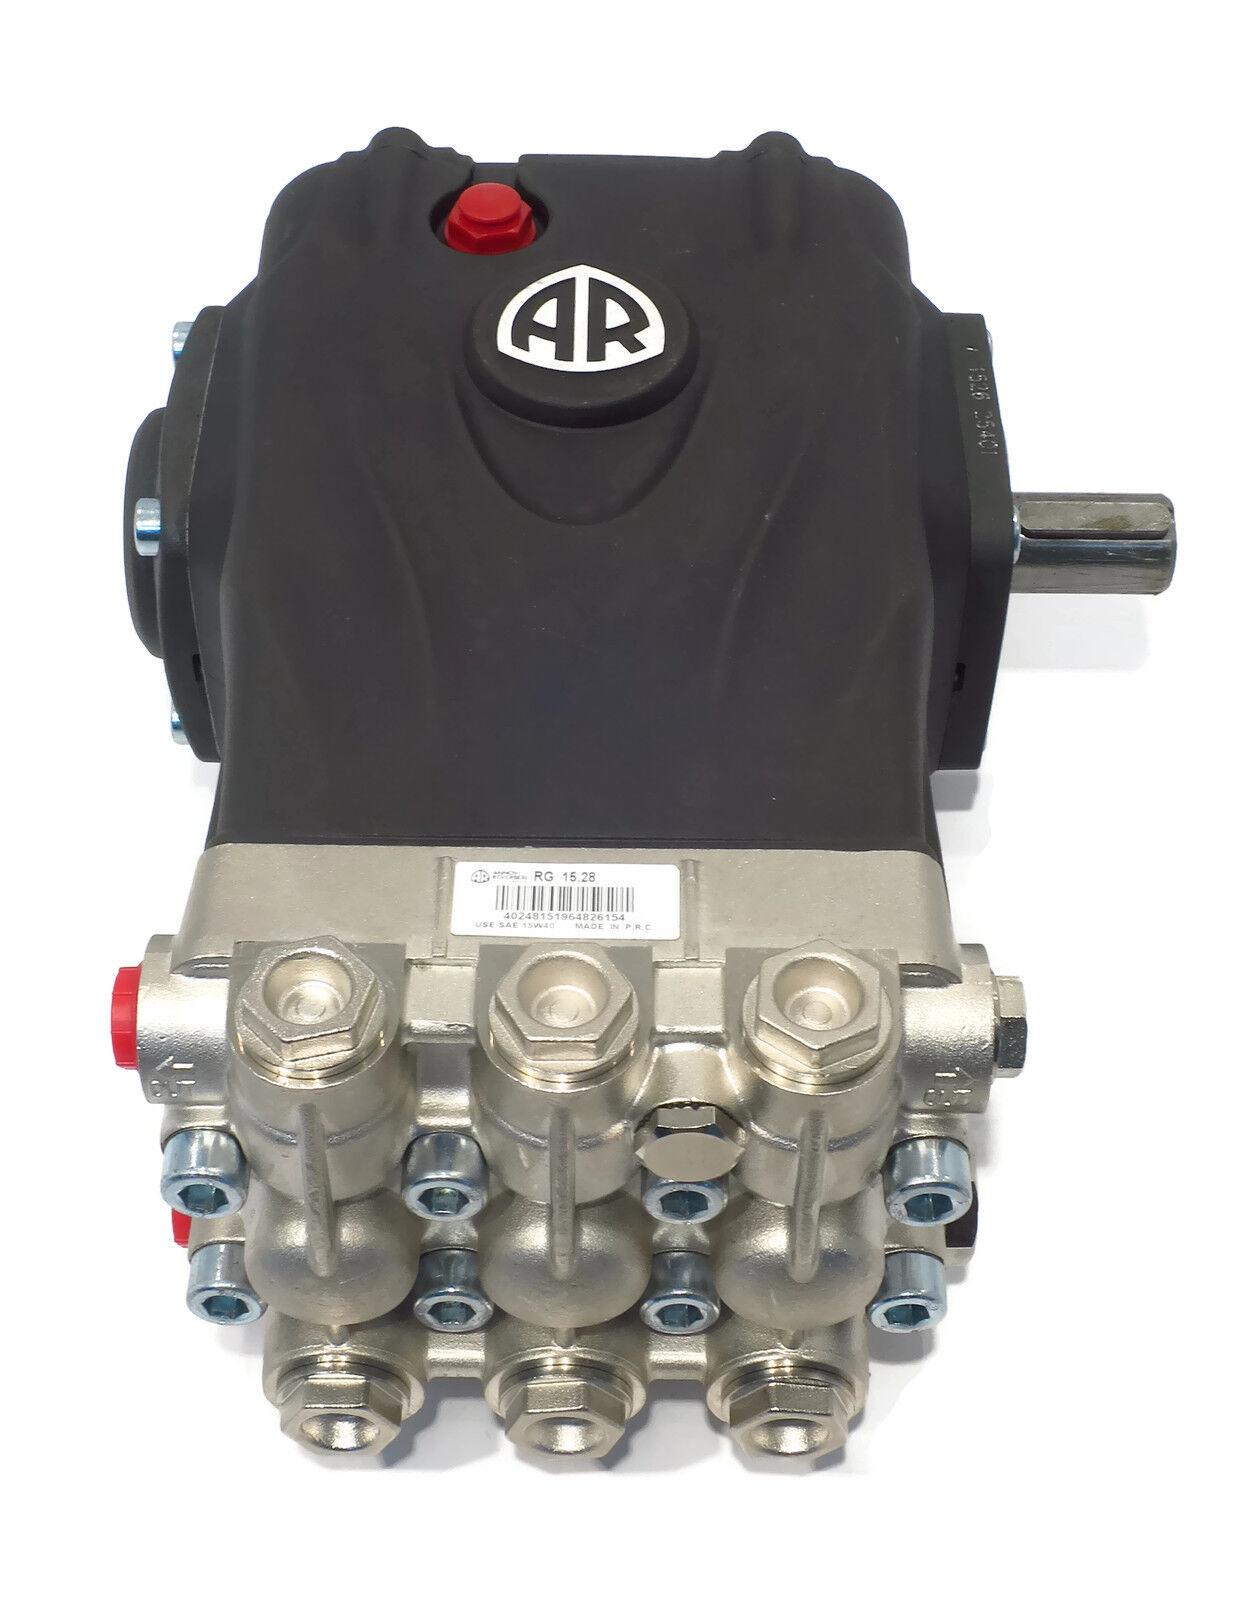 Pressure Washer Pump Replaces Interpump Ws101 4000 Psi